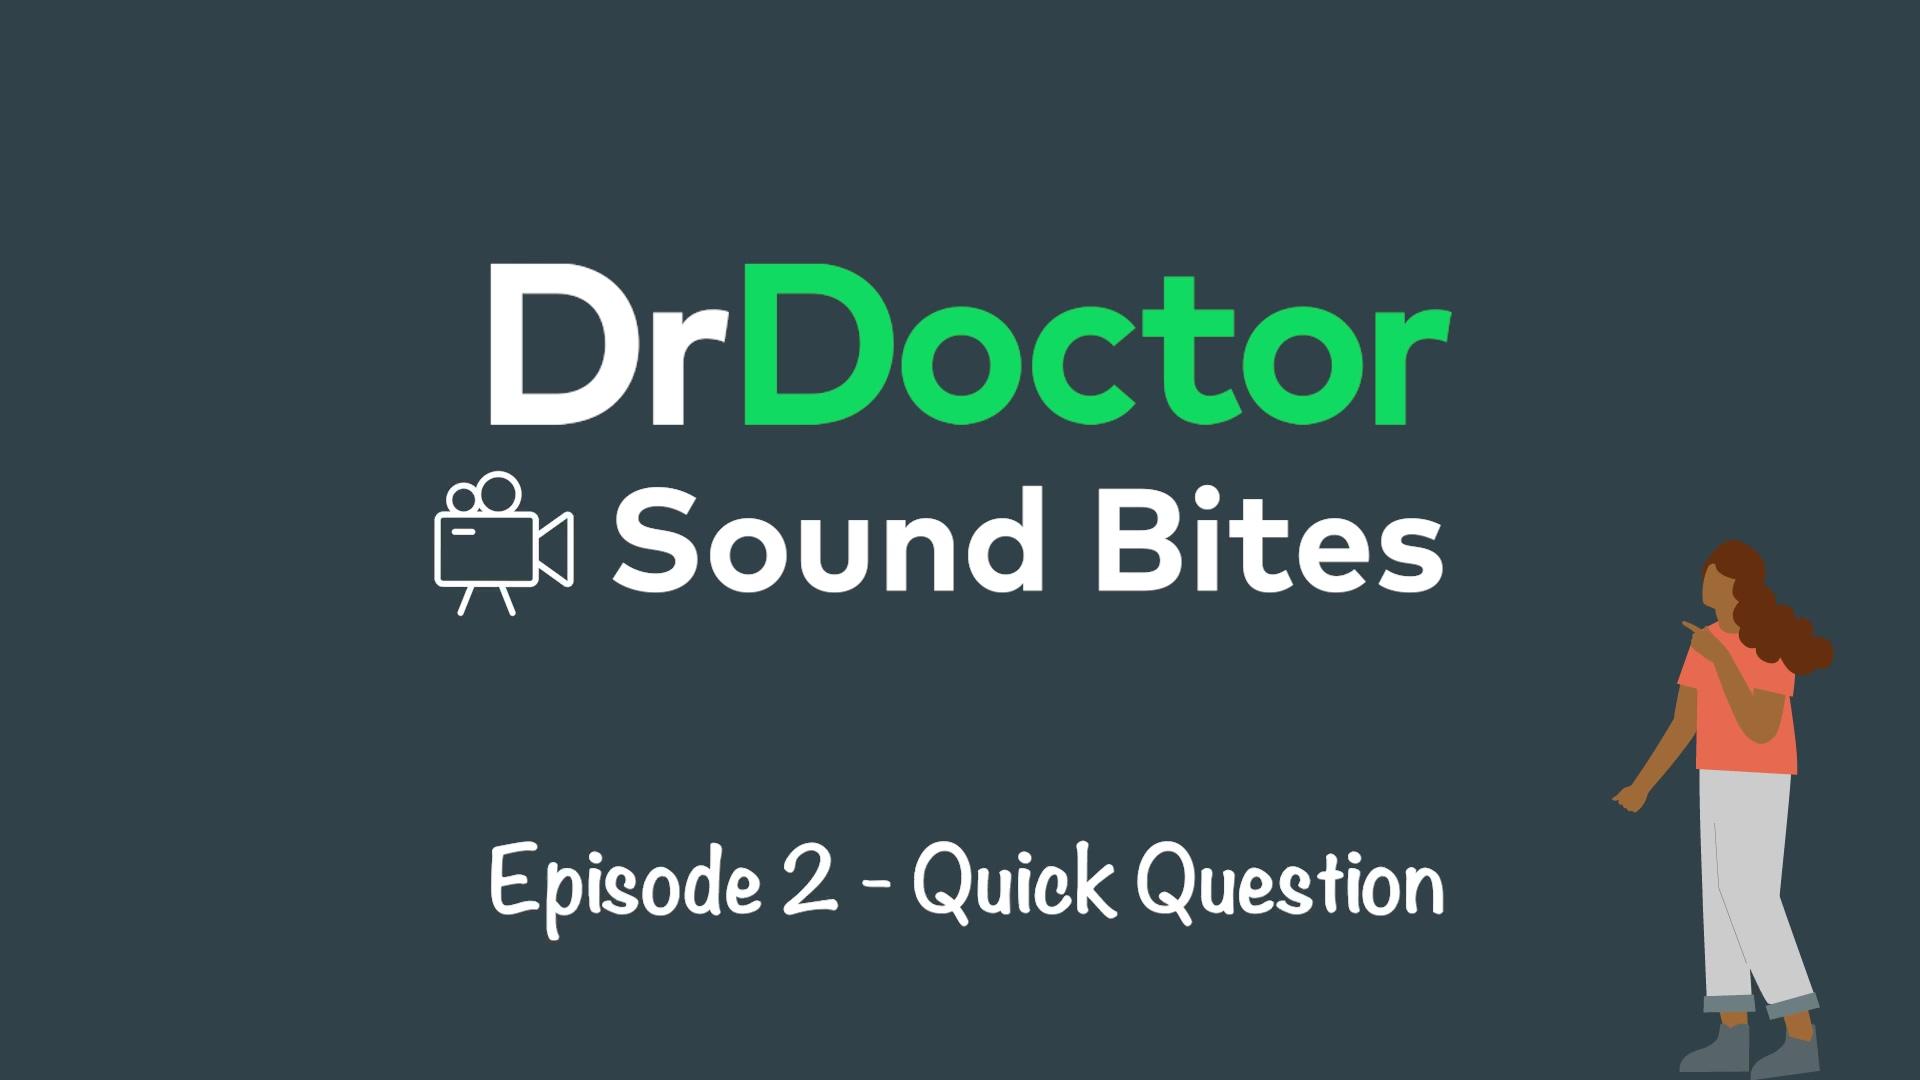 SOUND BITE EPISODE 2 - QUICK QUESTION (1)